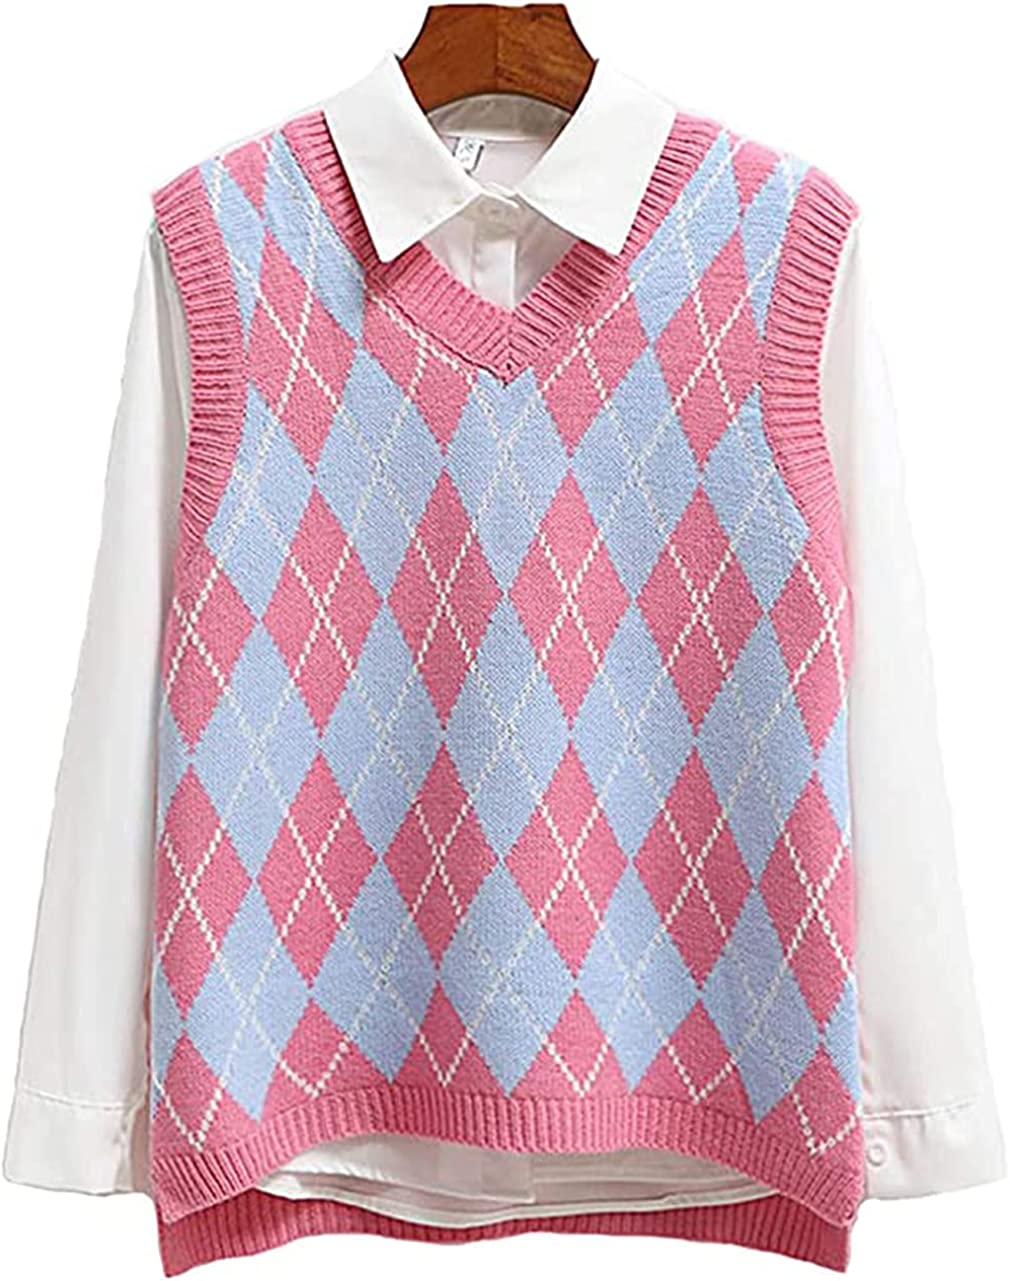 SLLSKY Argyle Fashion Knitted Vest Women Casual Korean Pullover Elasticity Sweater Spring Autumn Sleeveless V-Neck Tank Tops